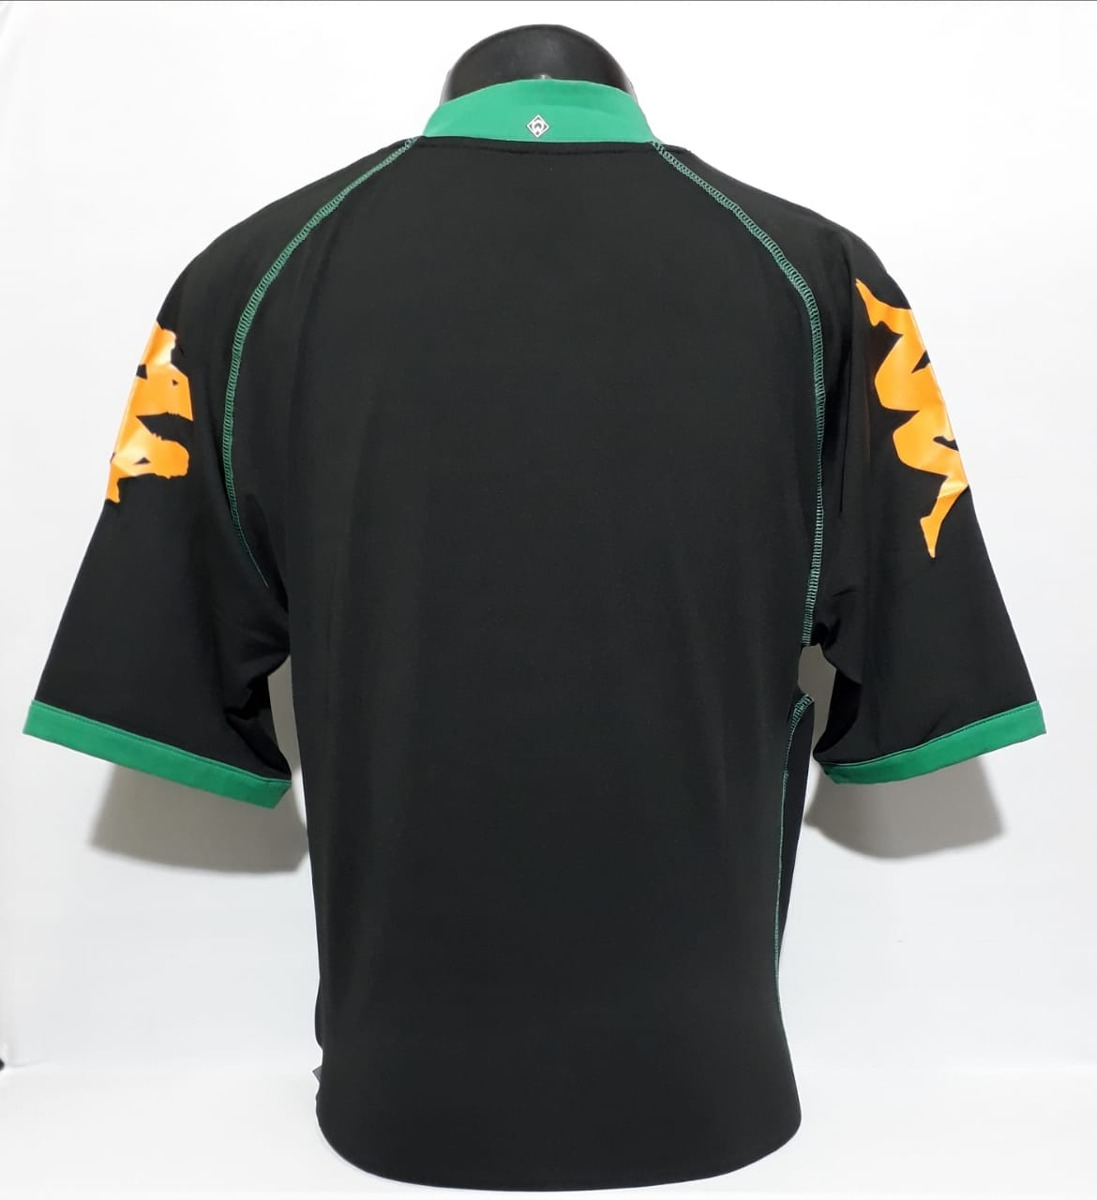 Camisa Werder Bremen Away Kappa Temporada 2009 - R  250 26d9f3e4bcd8a